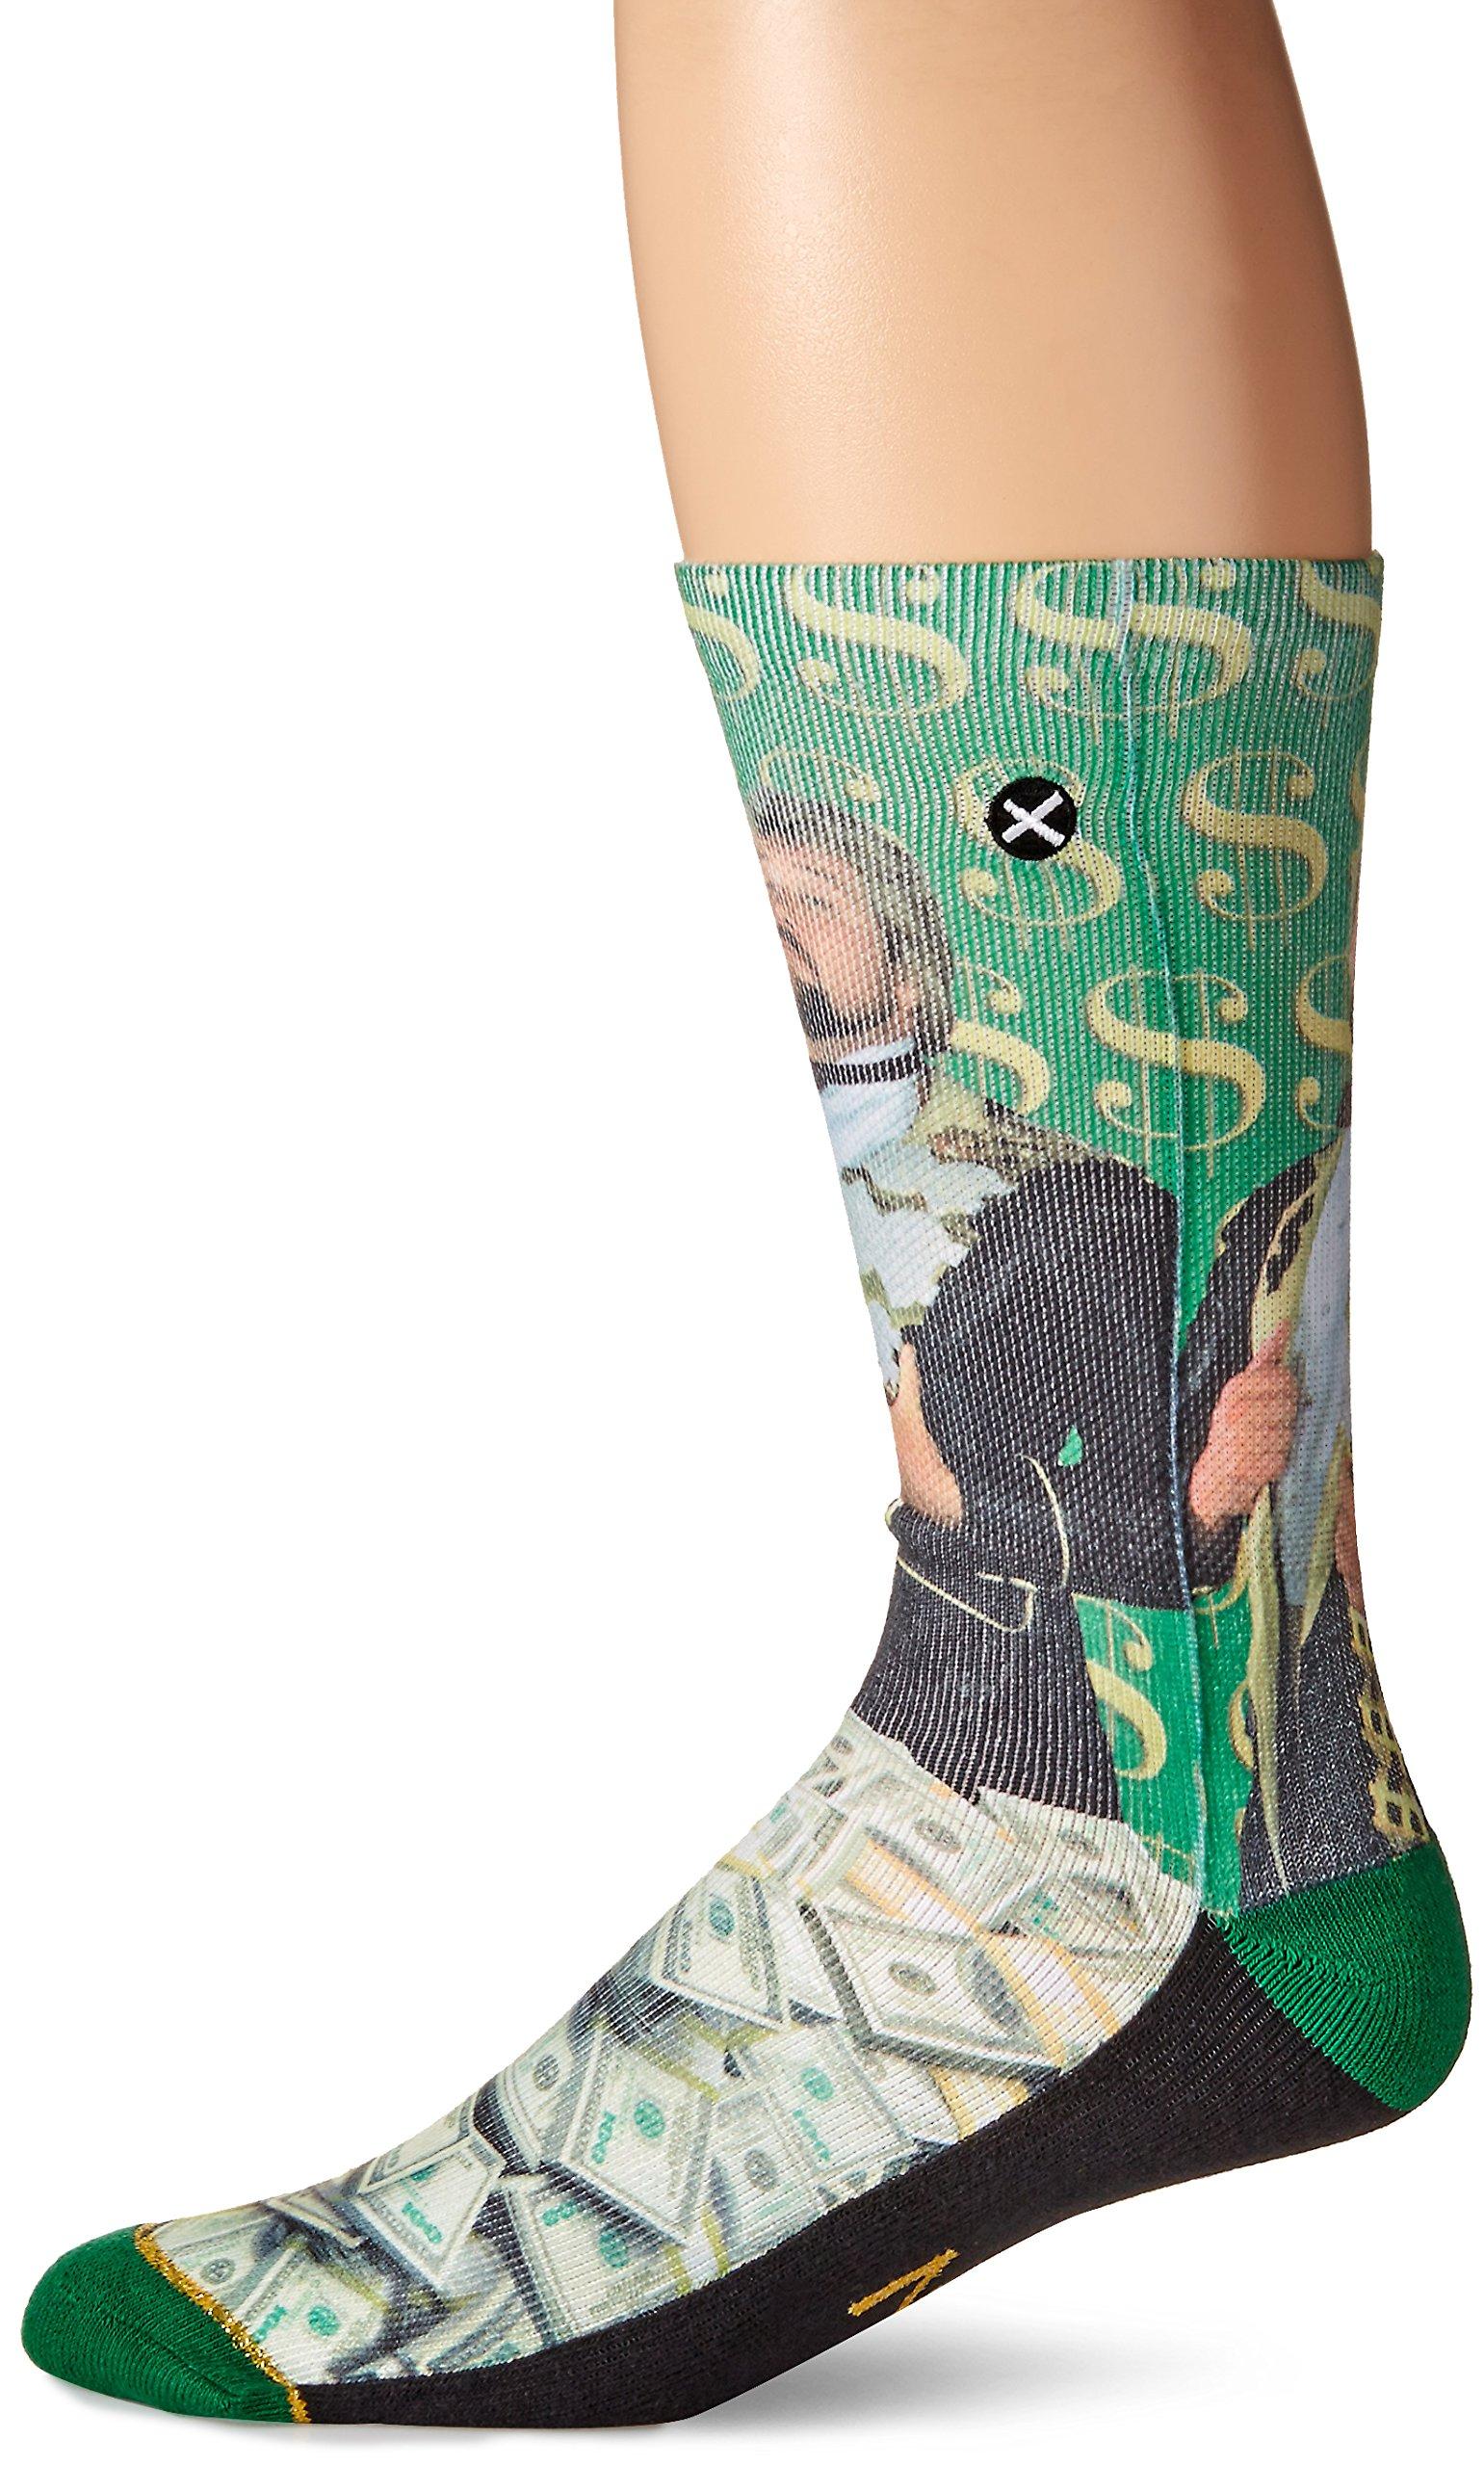 Odd Sox Men's Million Dollar Man, Multi, Sock Size:10-13/Shoe Size: 6-12